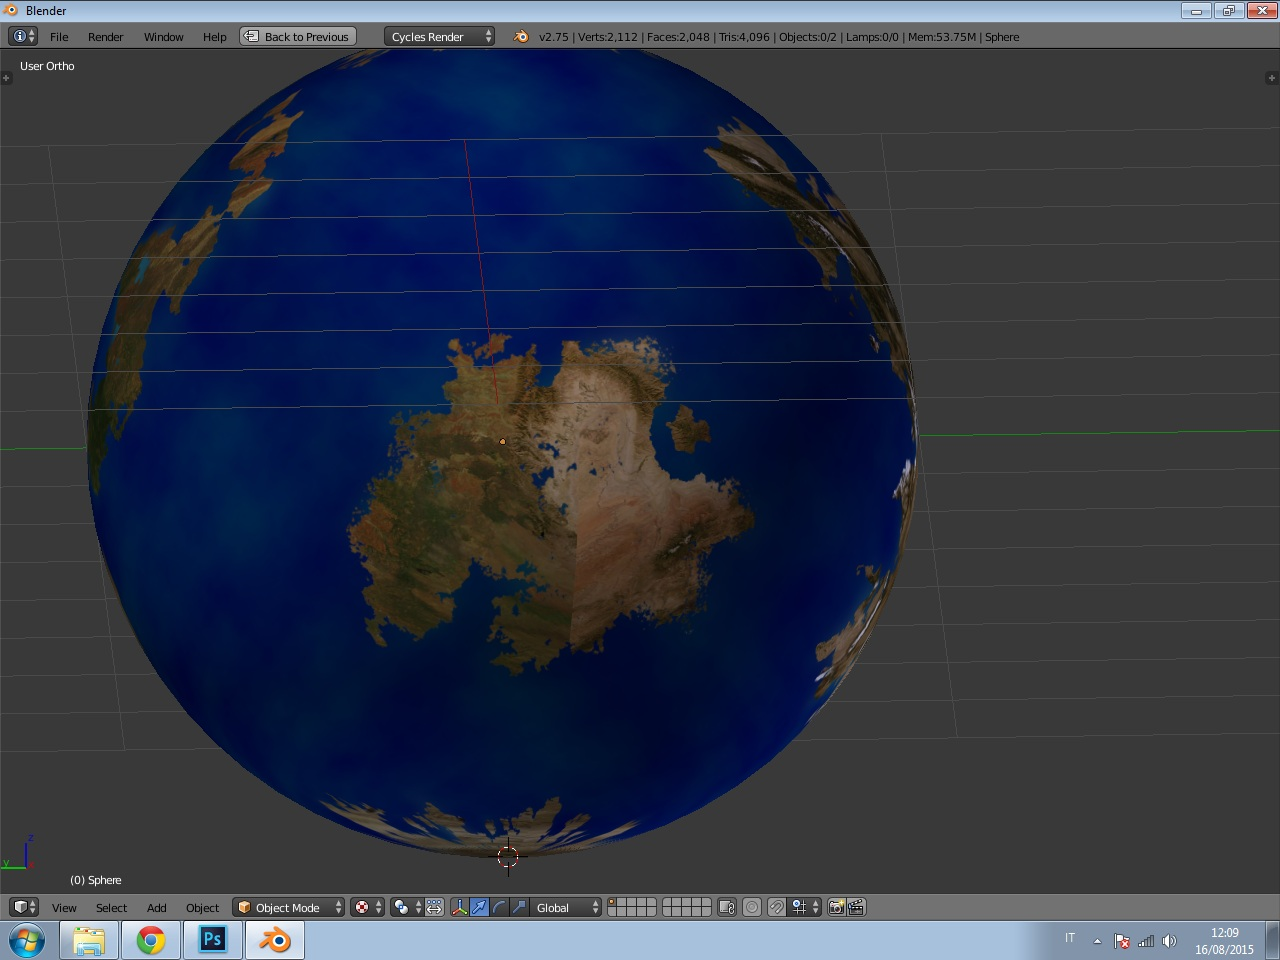 HELP] Planet texture - Materials and Textures - Blender